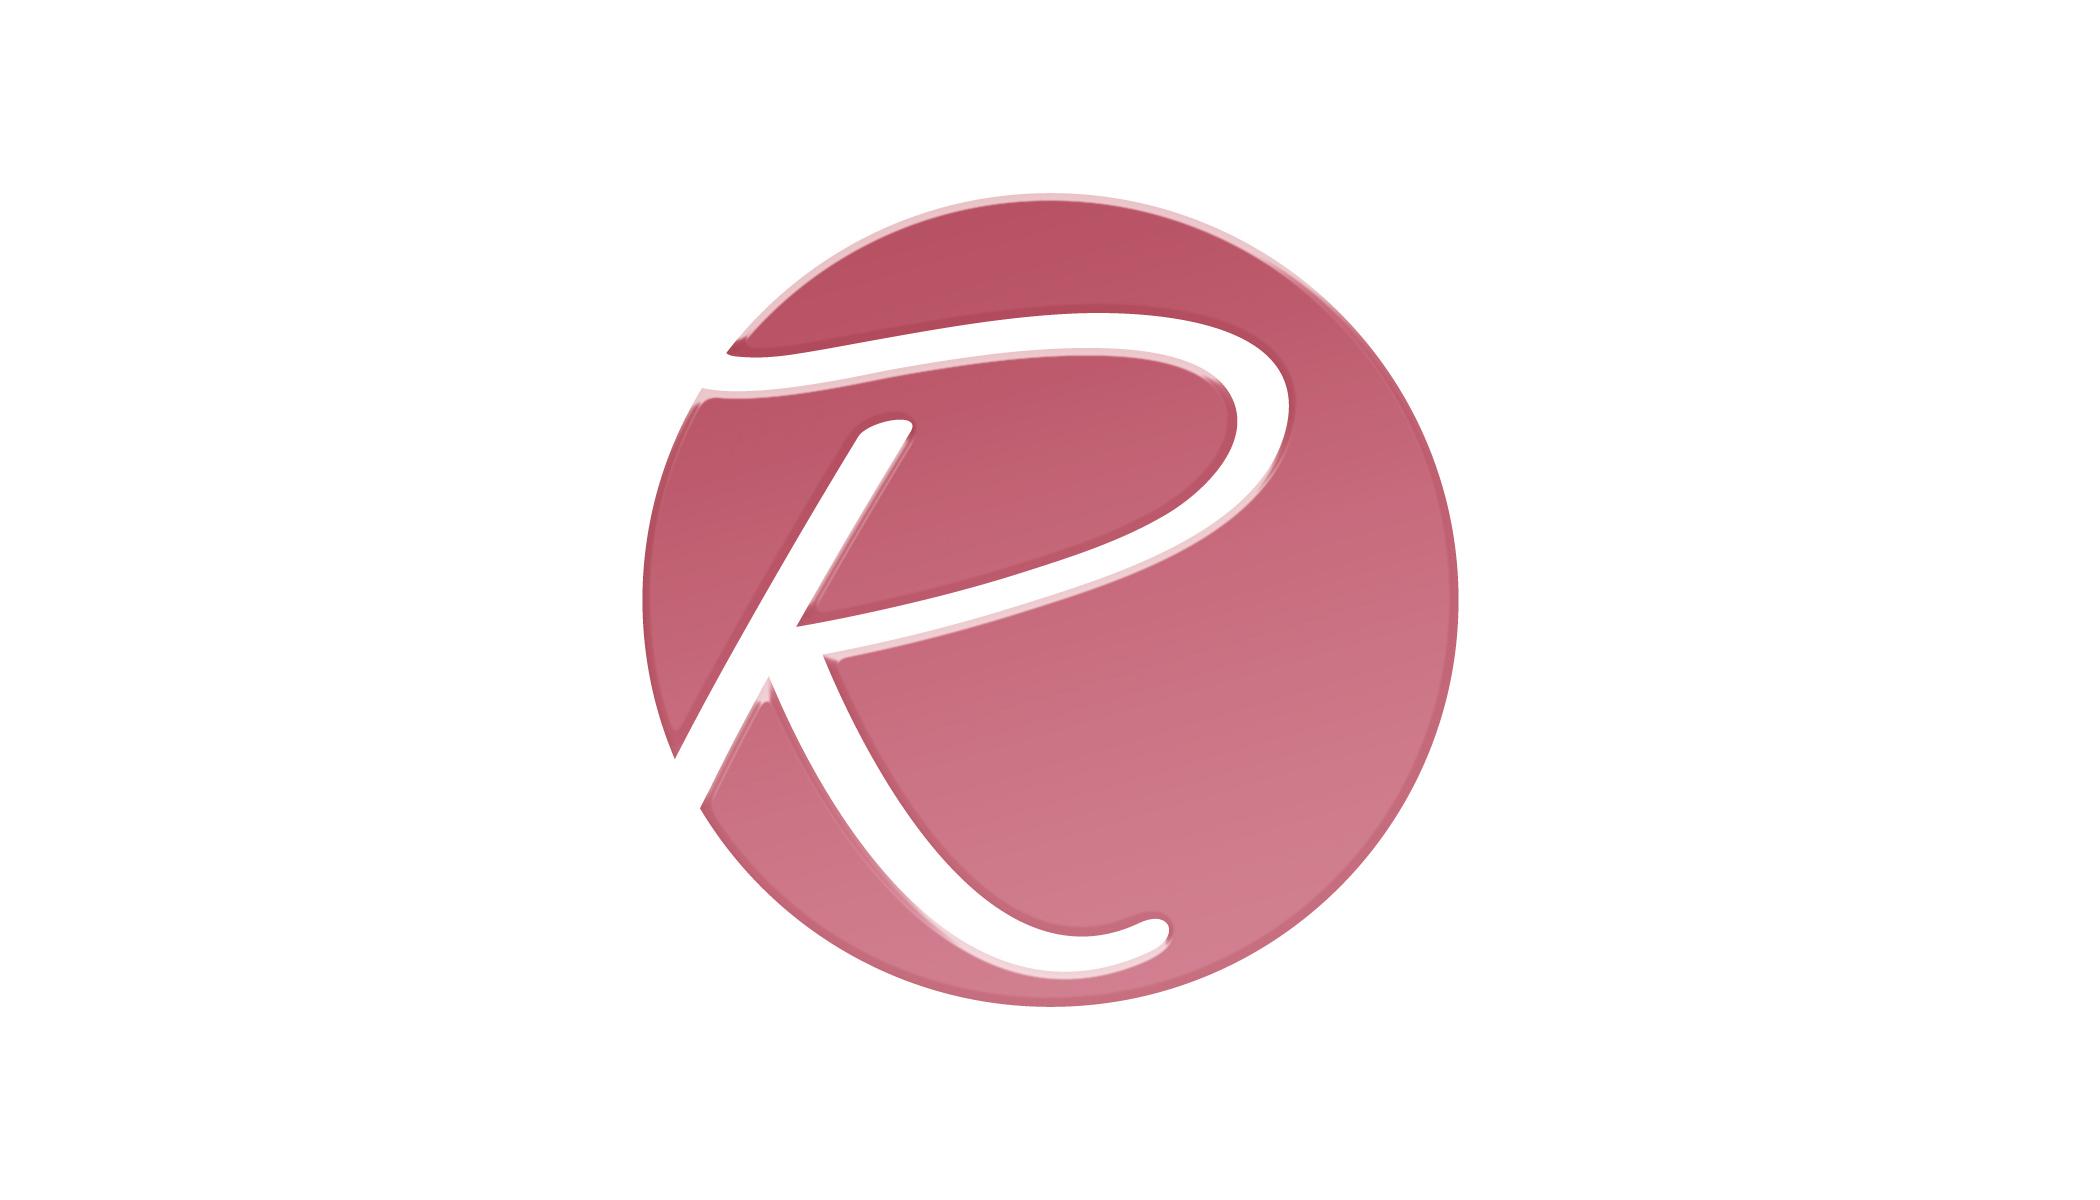 RSymbol_Rose_Effect.jpg